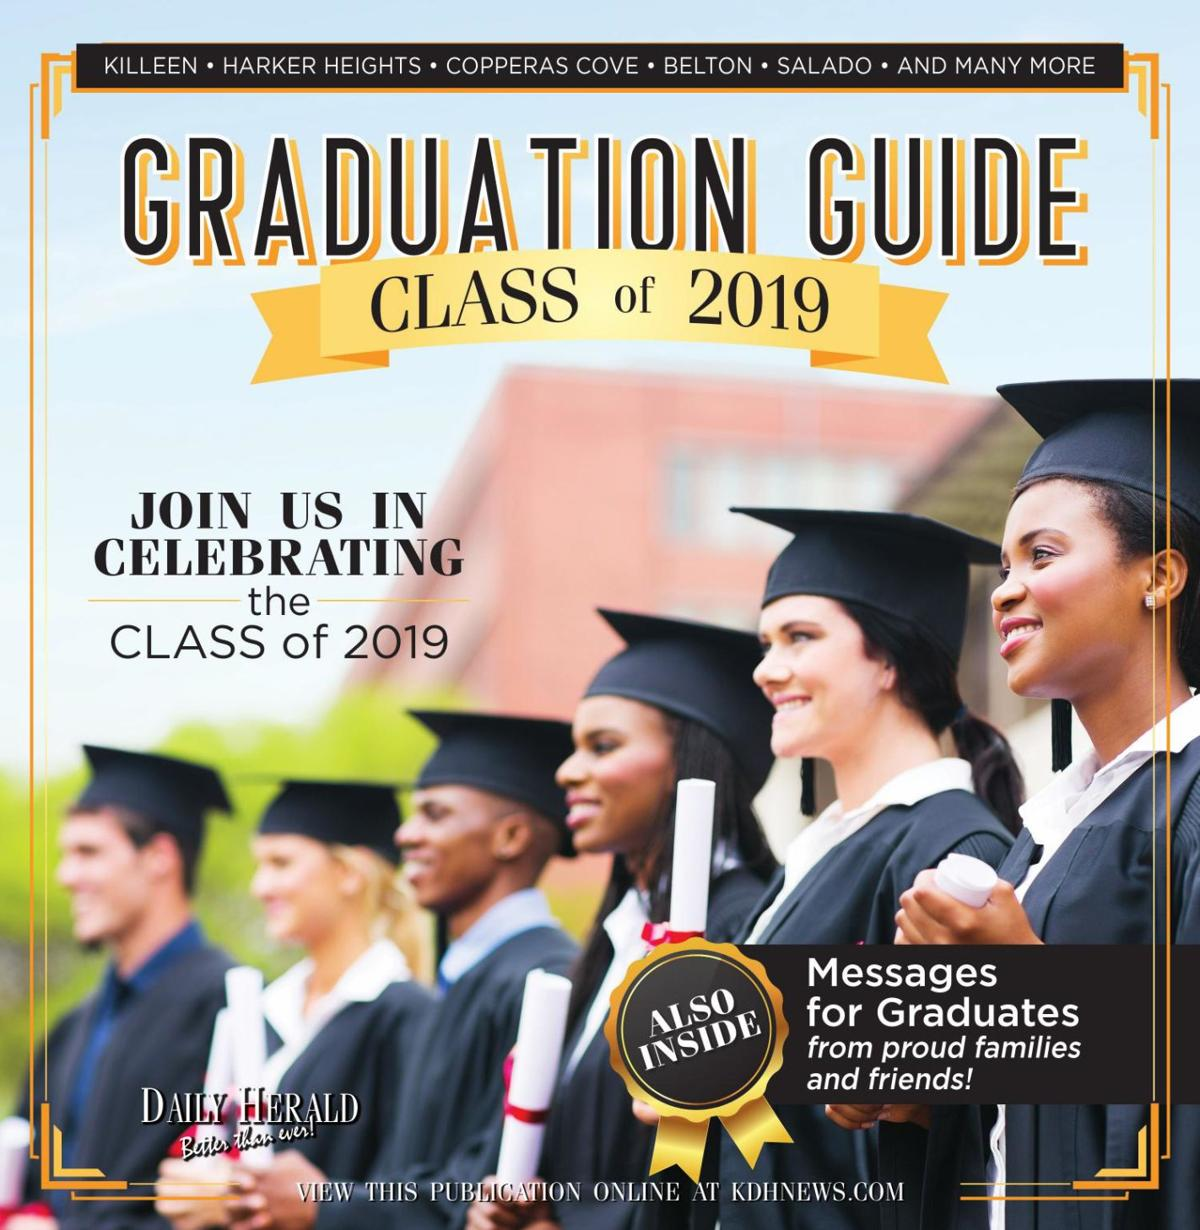 Graduation Guide 2019